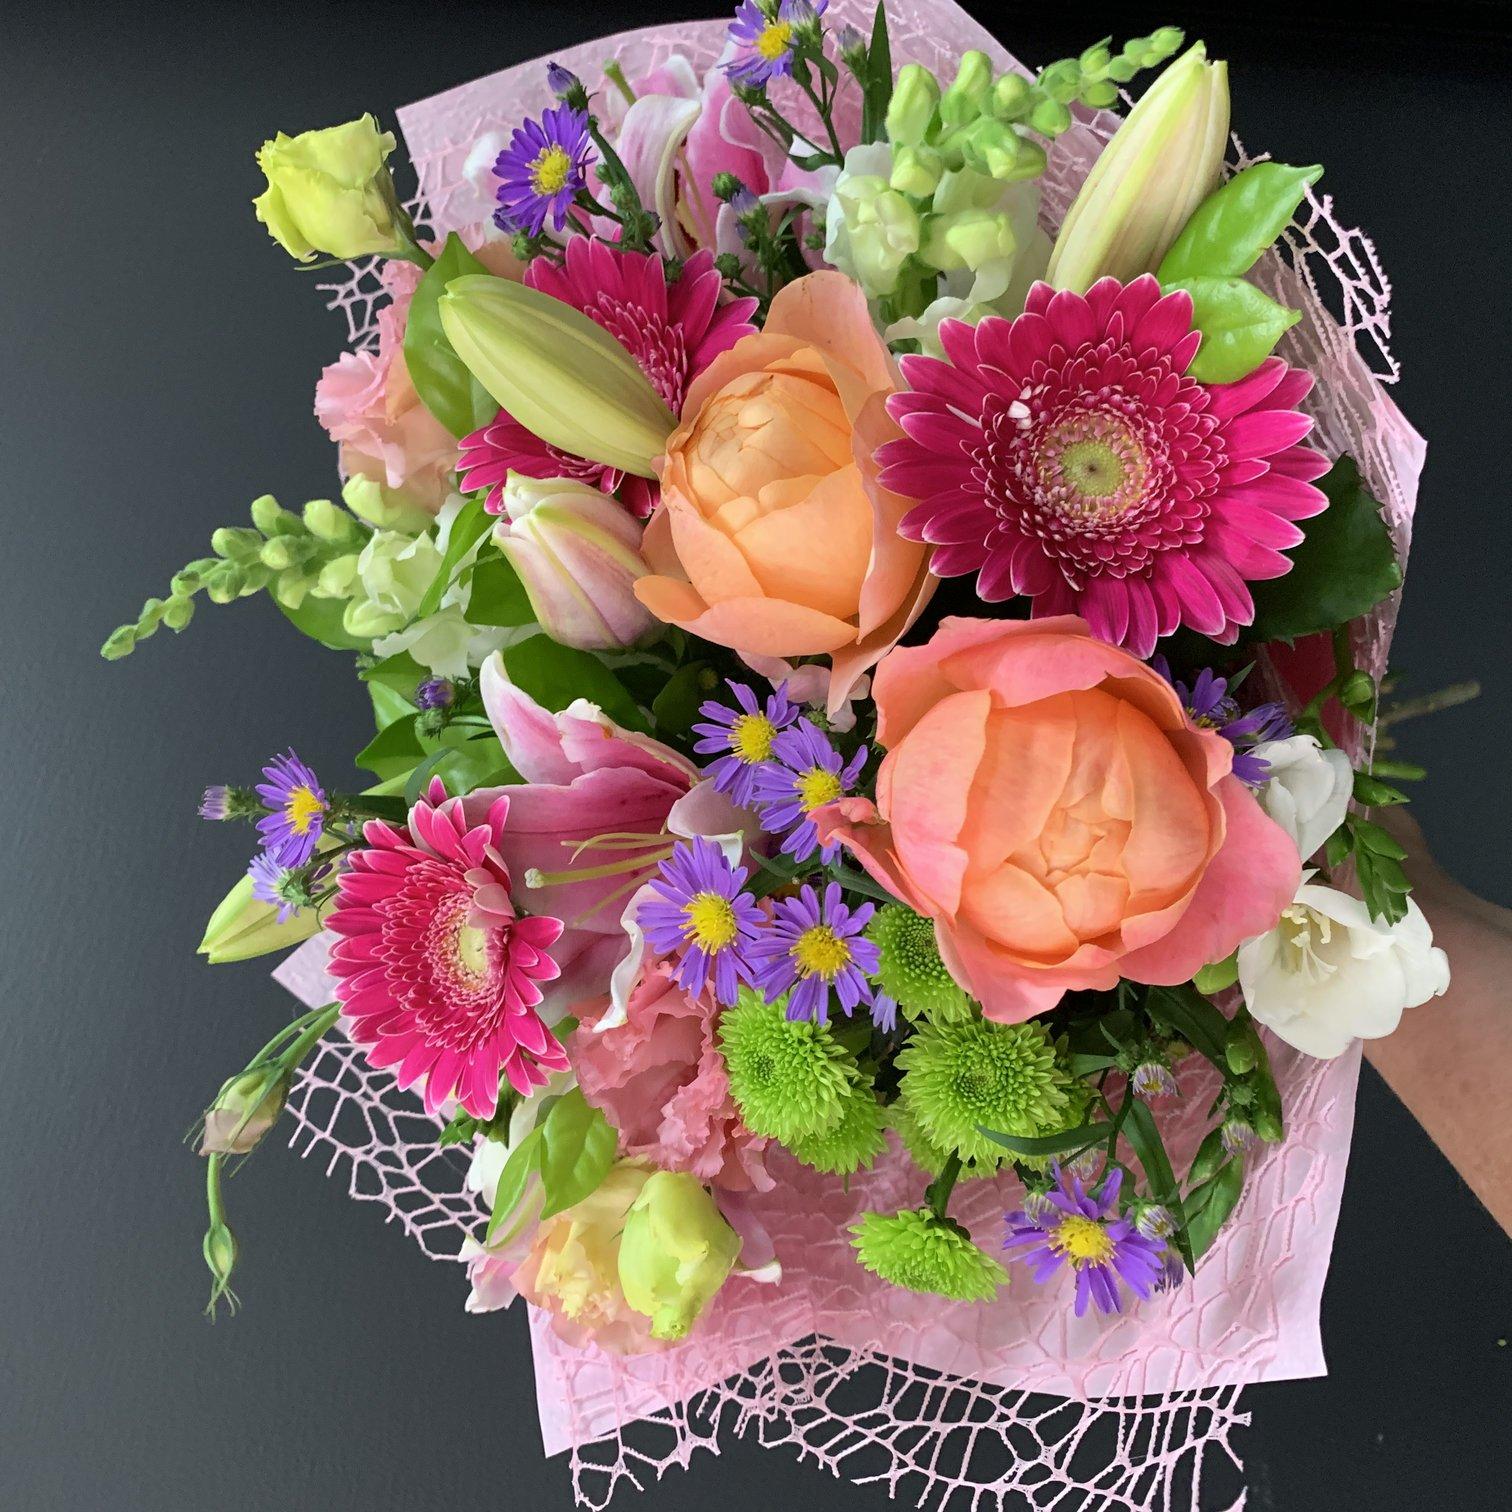 Florist Choice - Seasonal Blooms